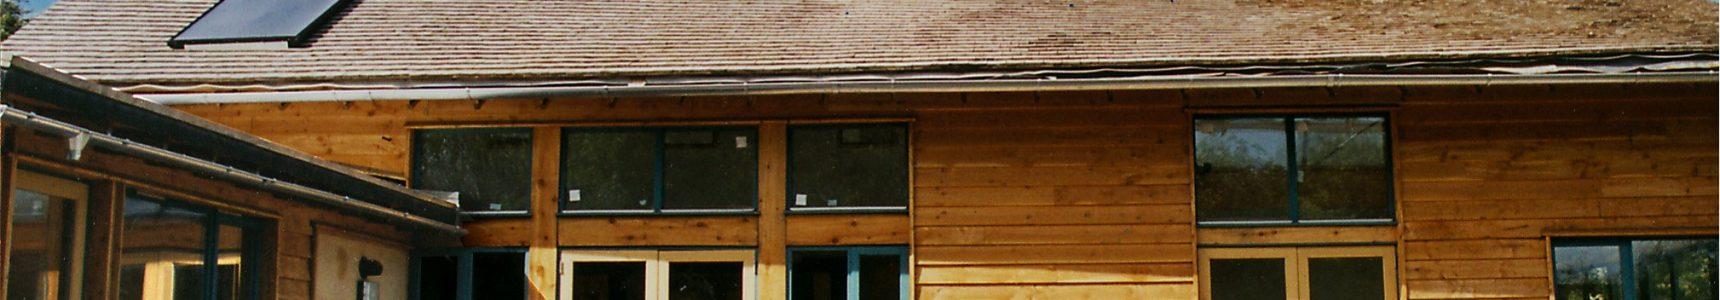 Sutton Courtenay Environmental Education Centre Simmonds